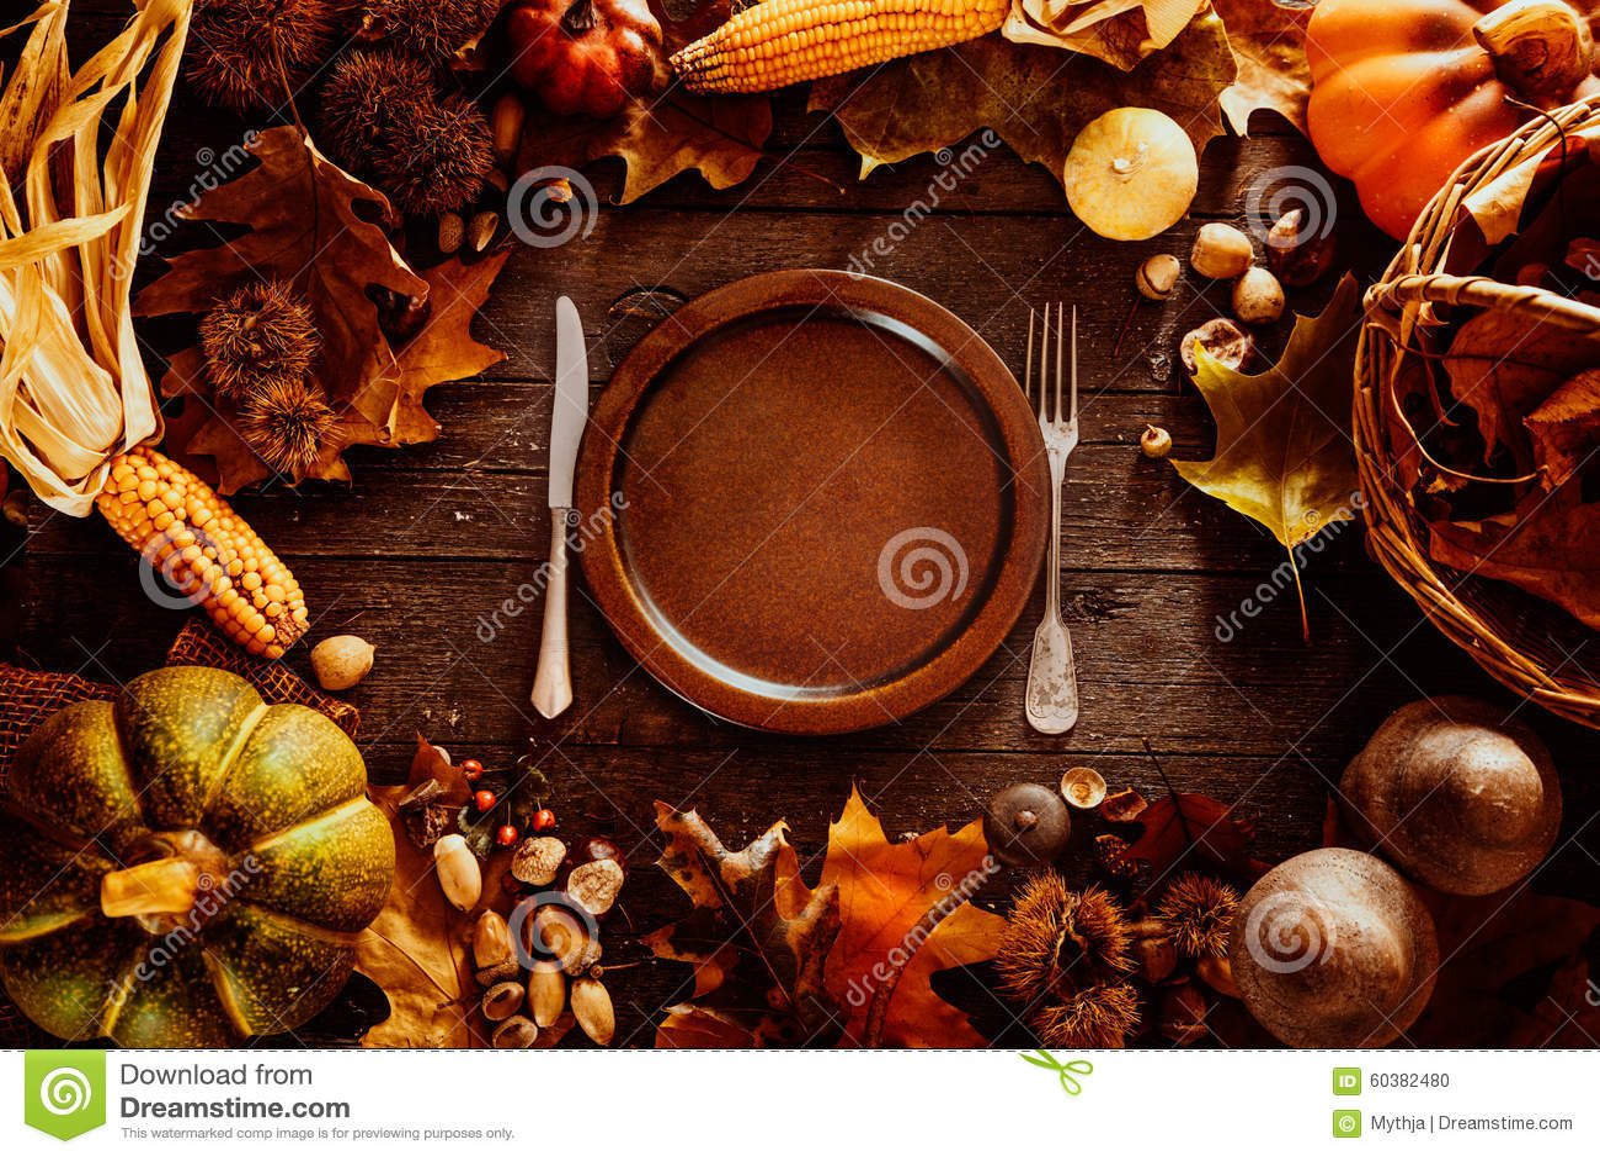 Thanksgiving Dinner Stock Photo Image 60382480